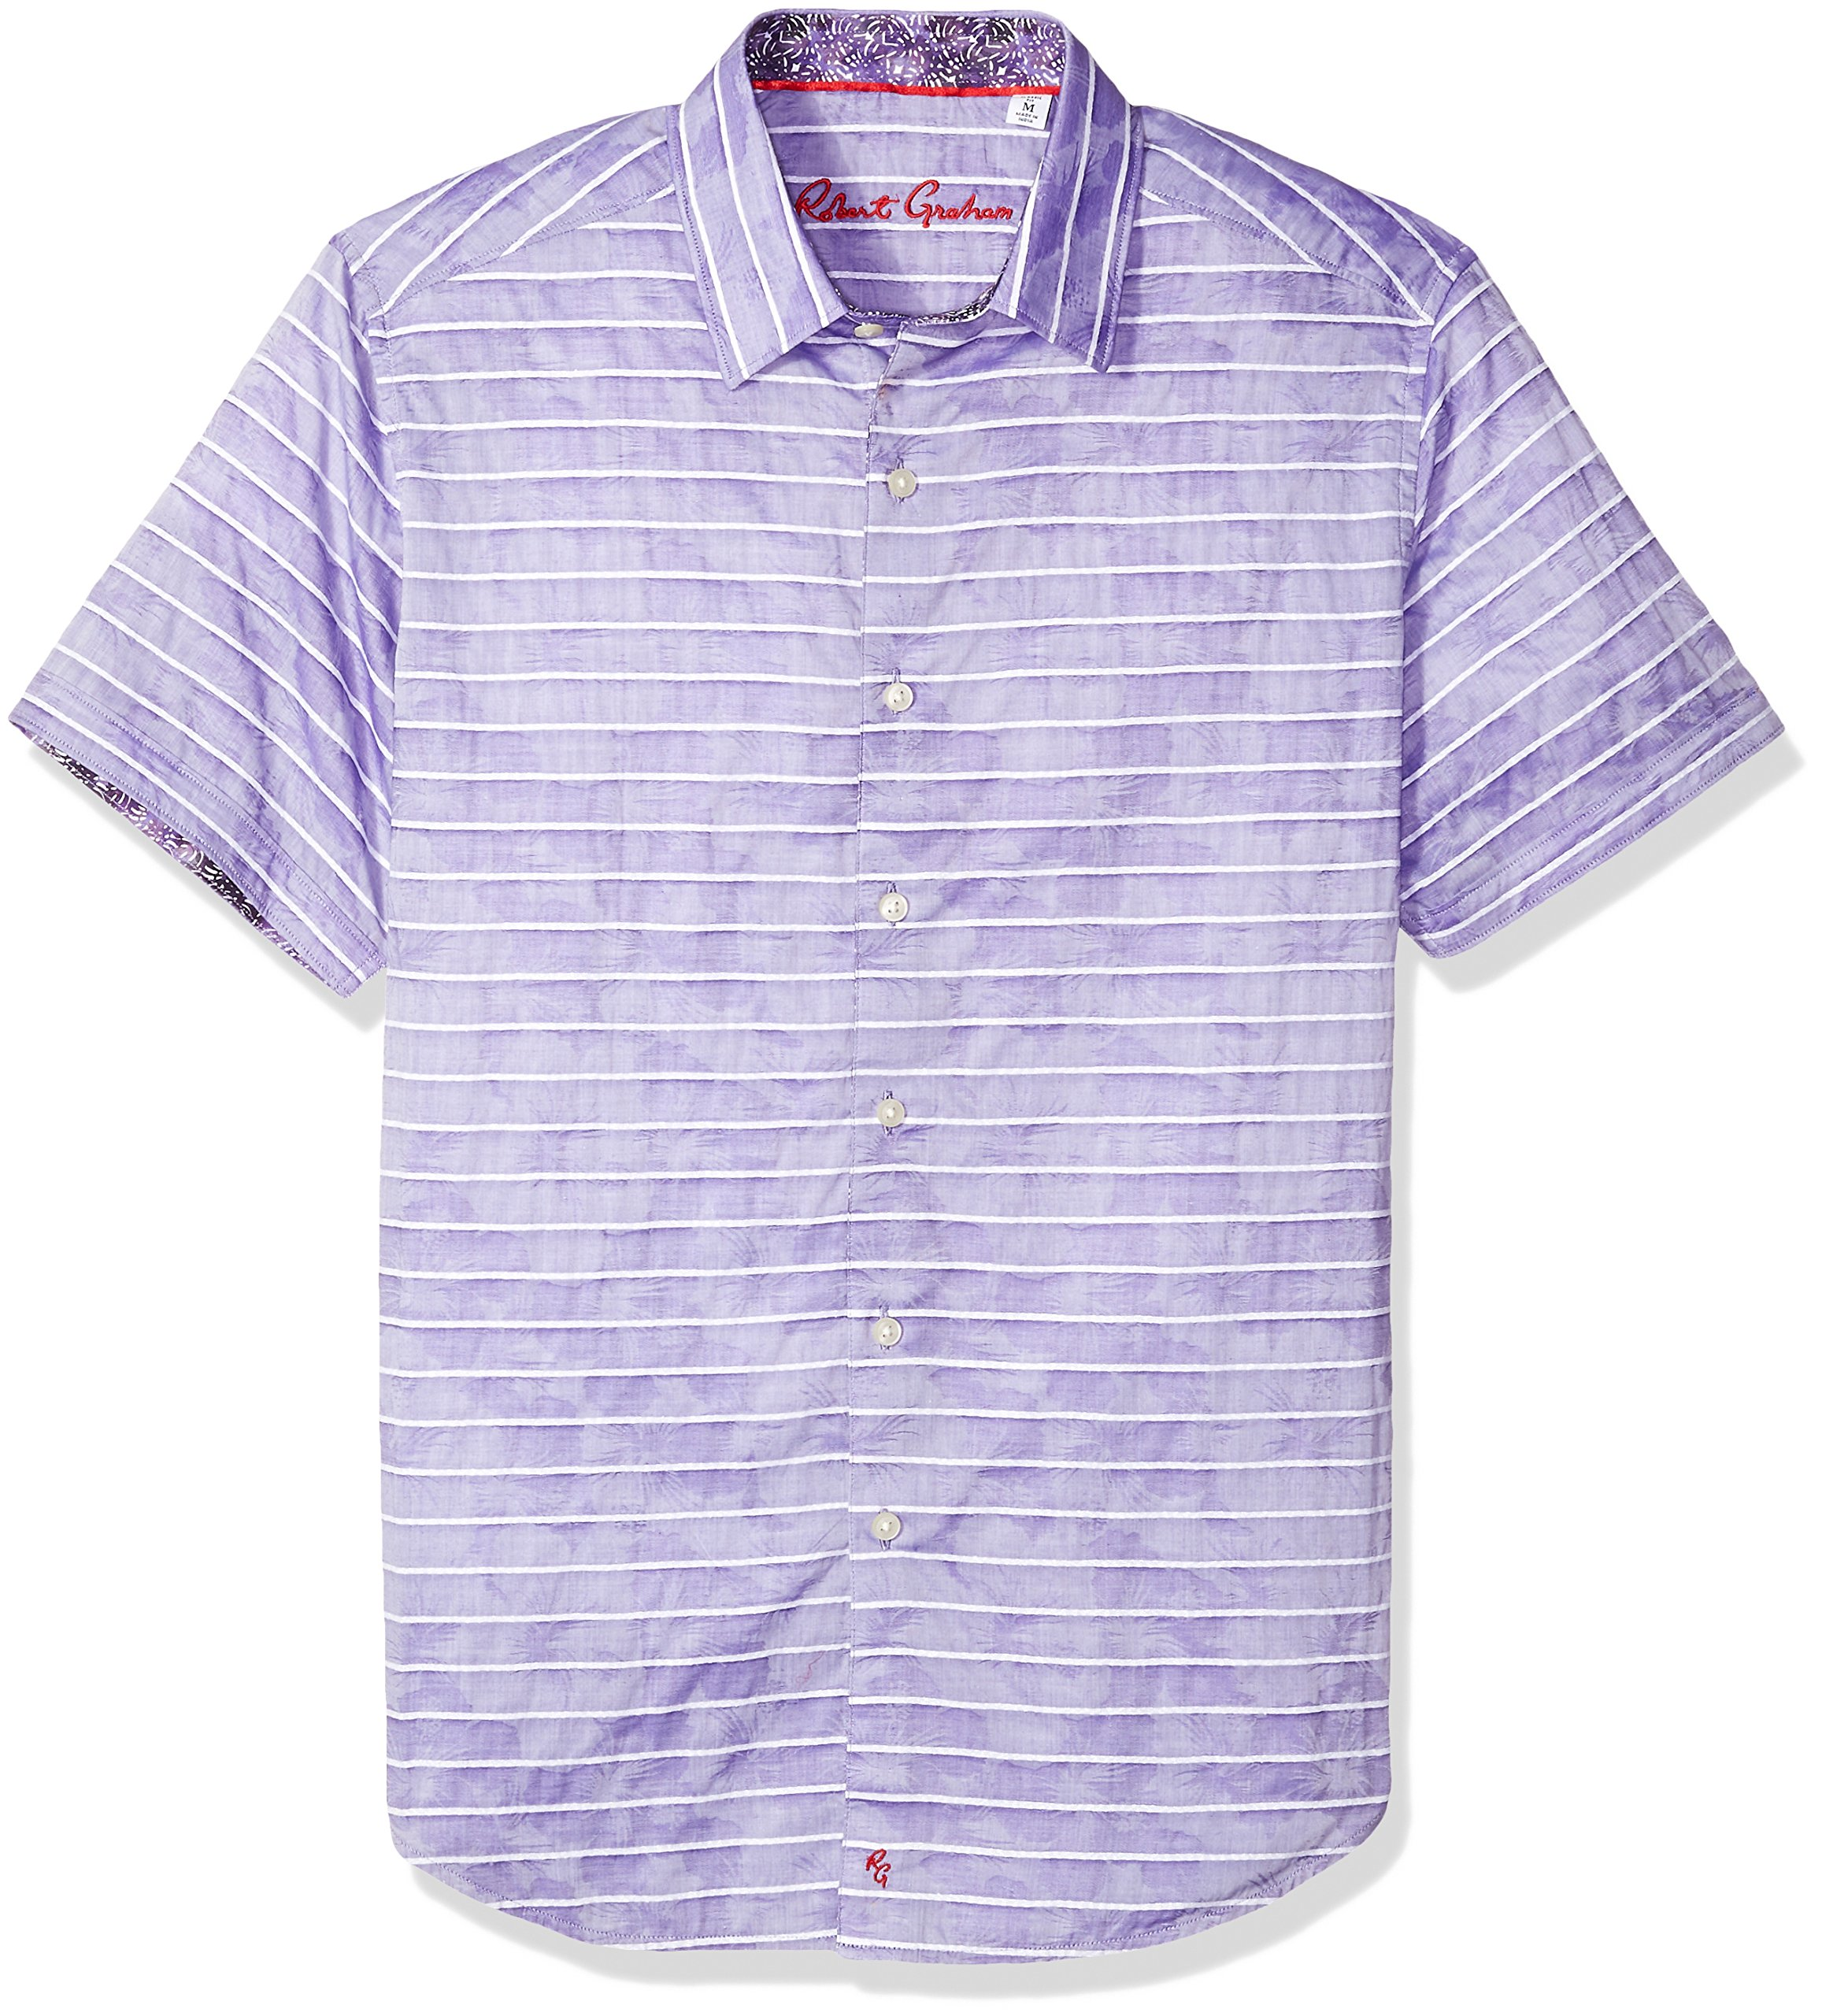 Robert Graham Men's AVENIDA Short Sleeve Shirt, Purple, Large